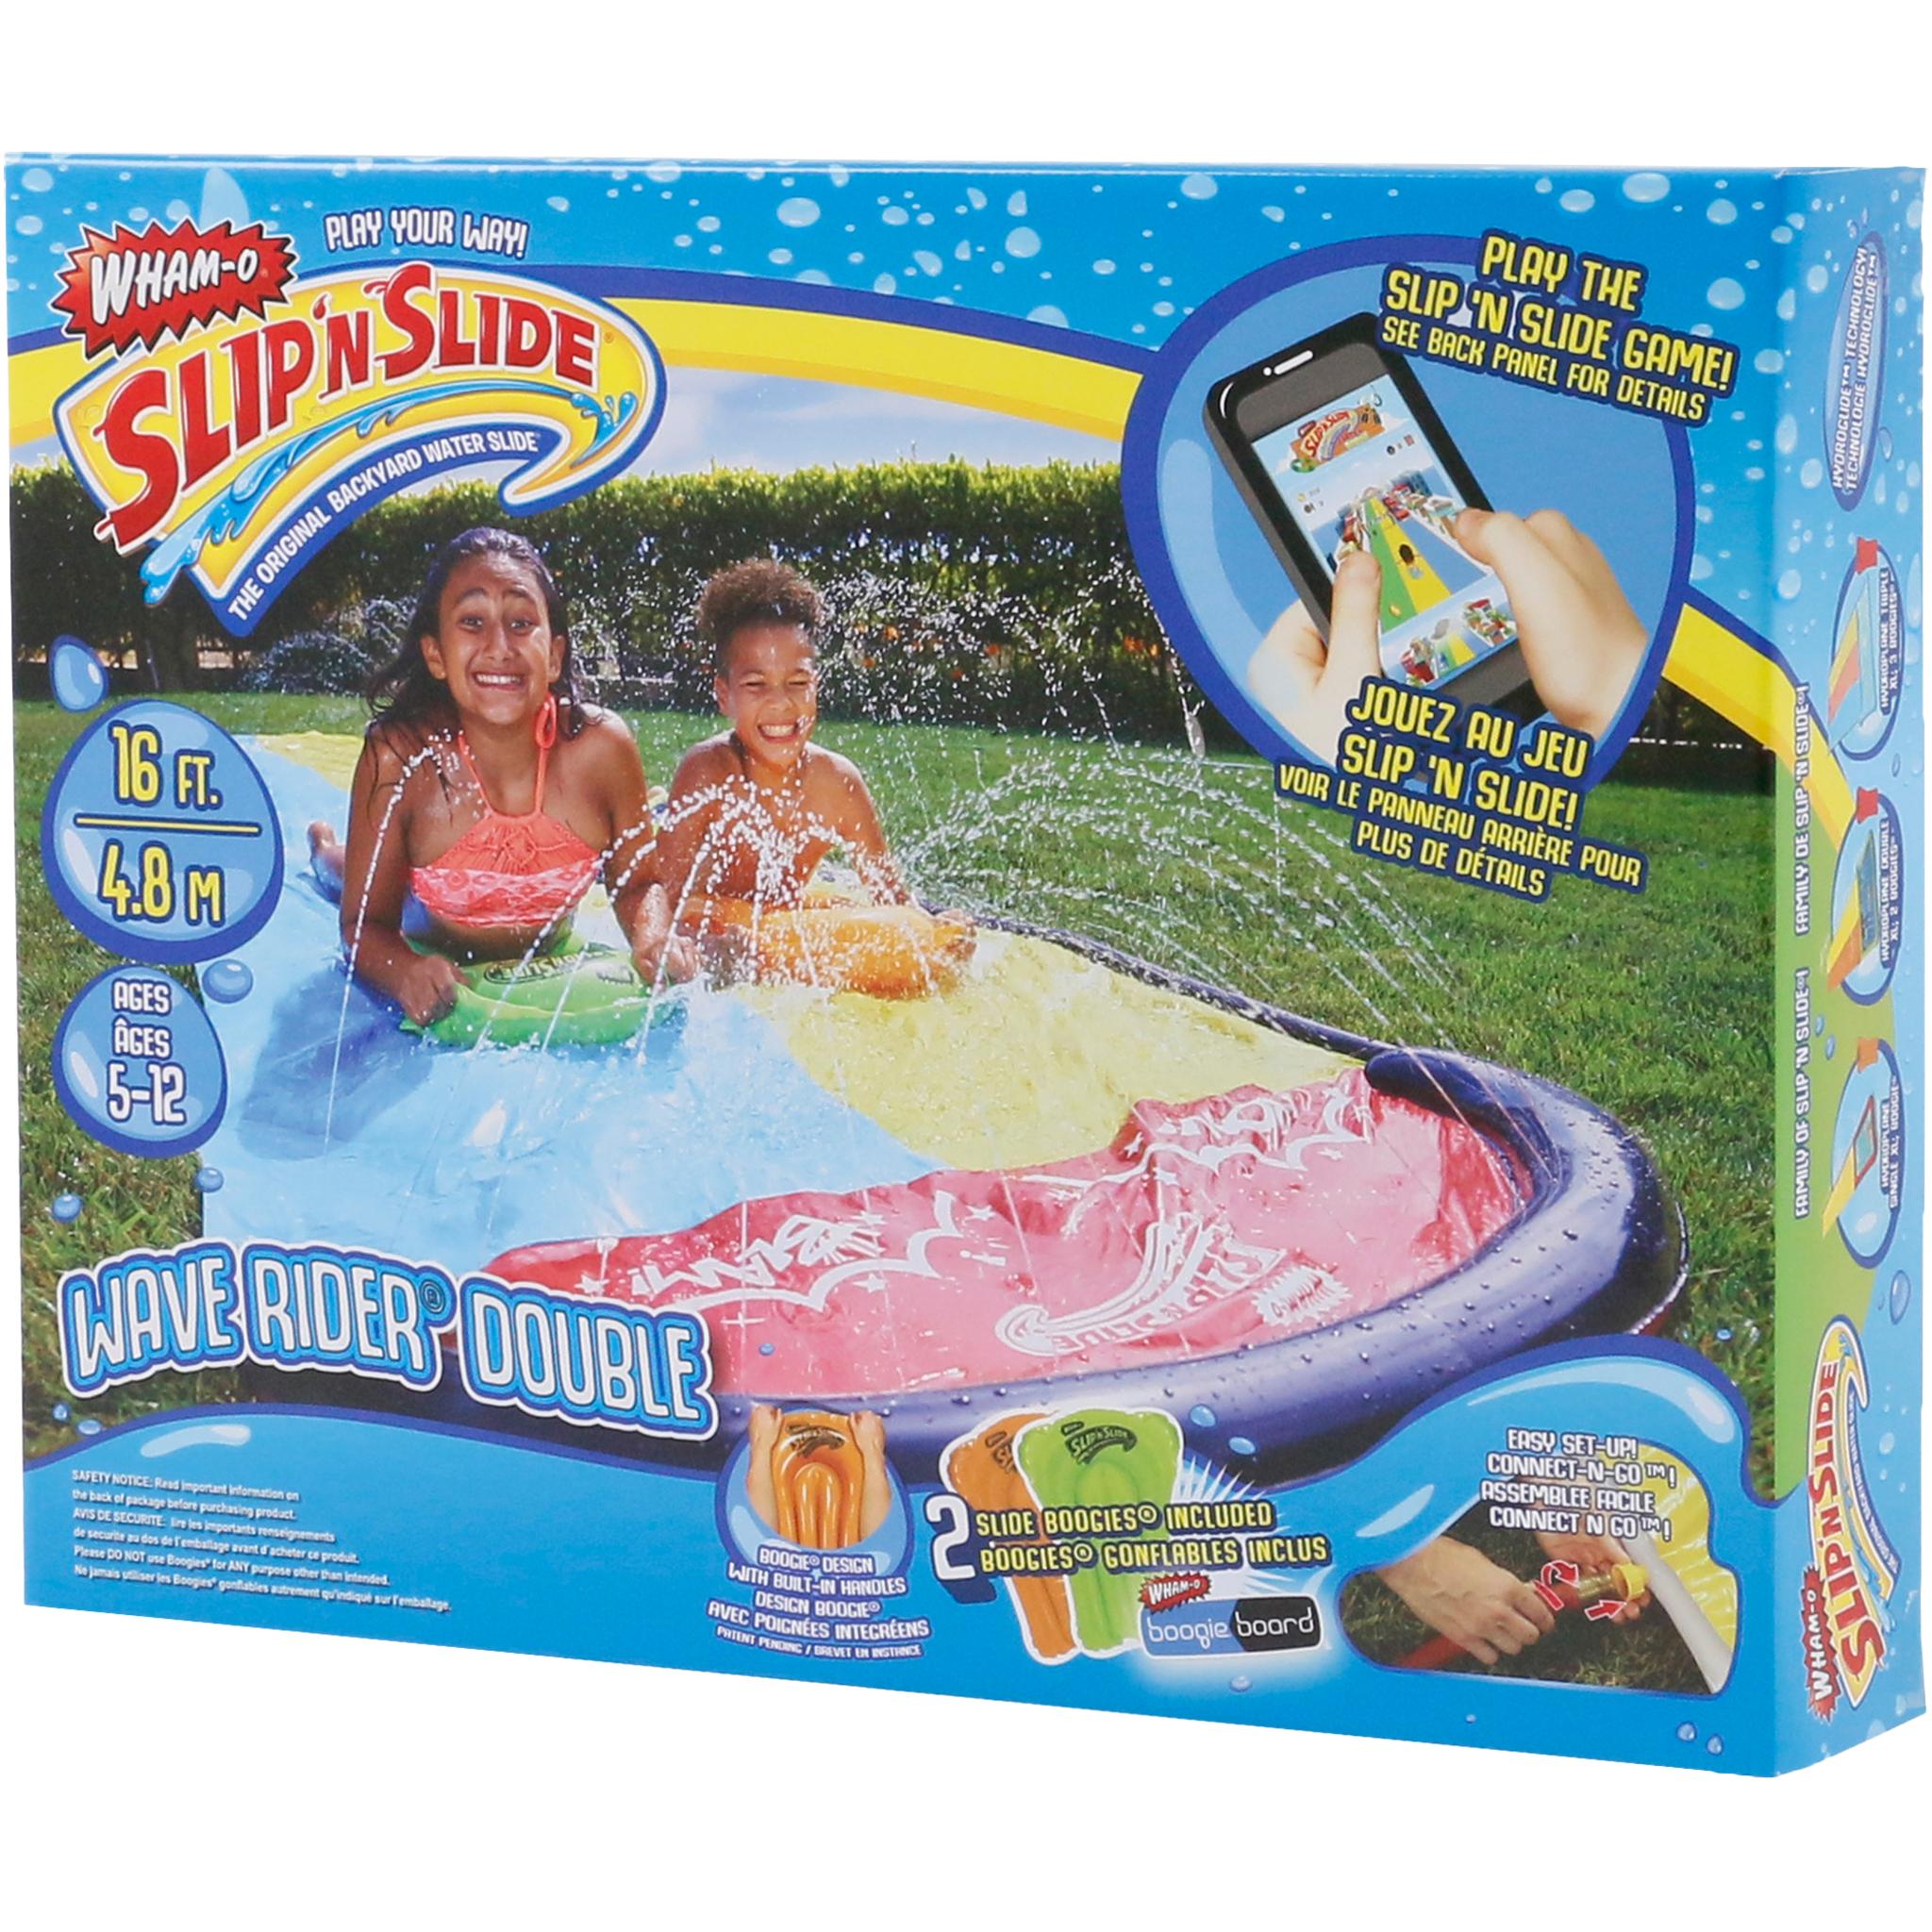 WHAM-O Slip N Slide Waterslide Double, vannbane